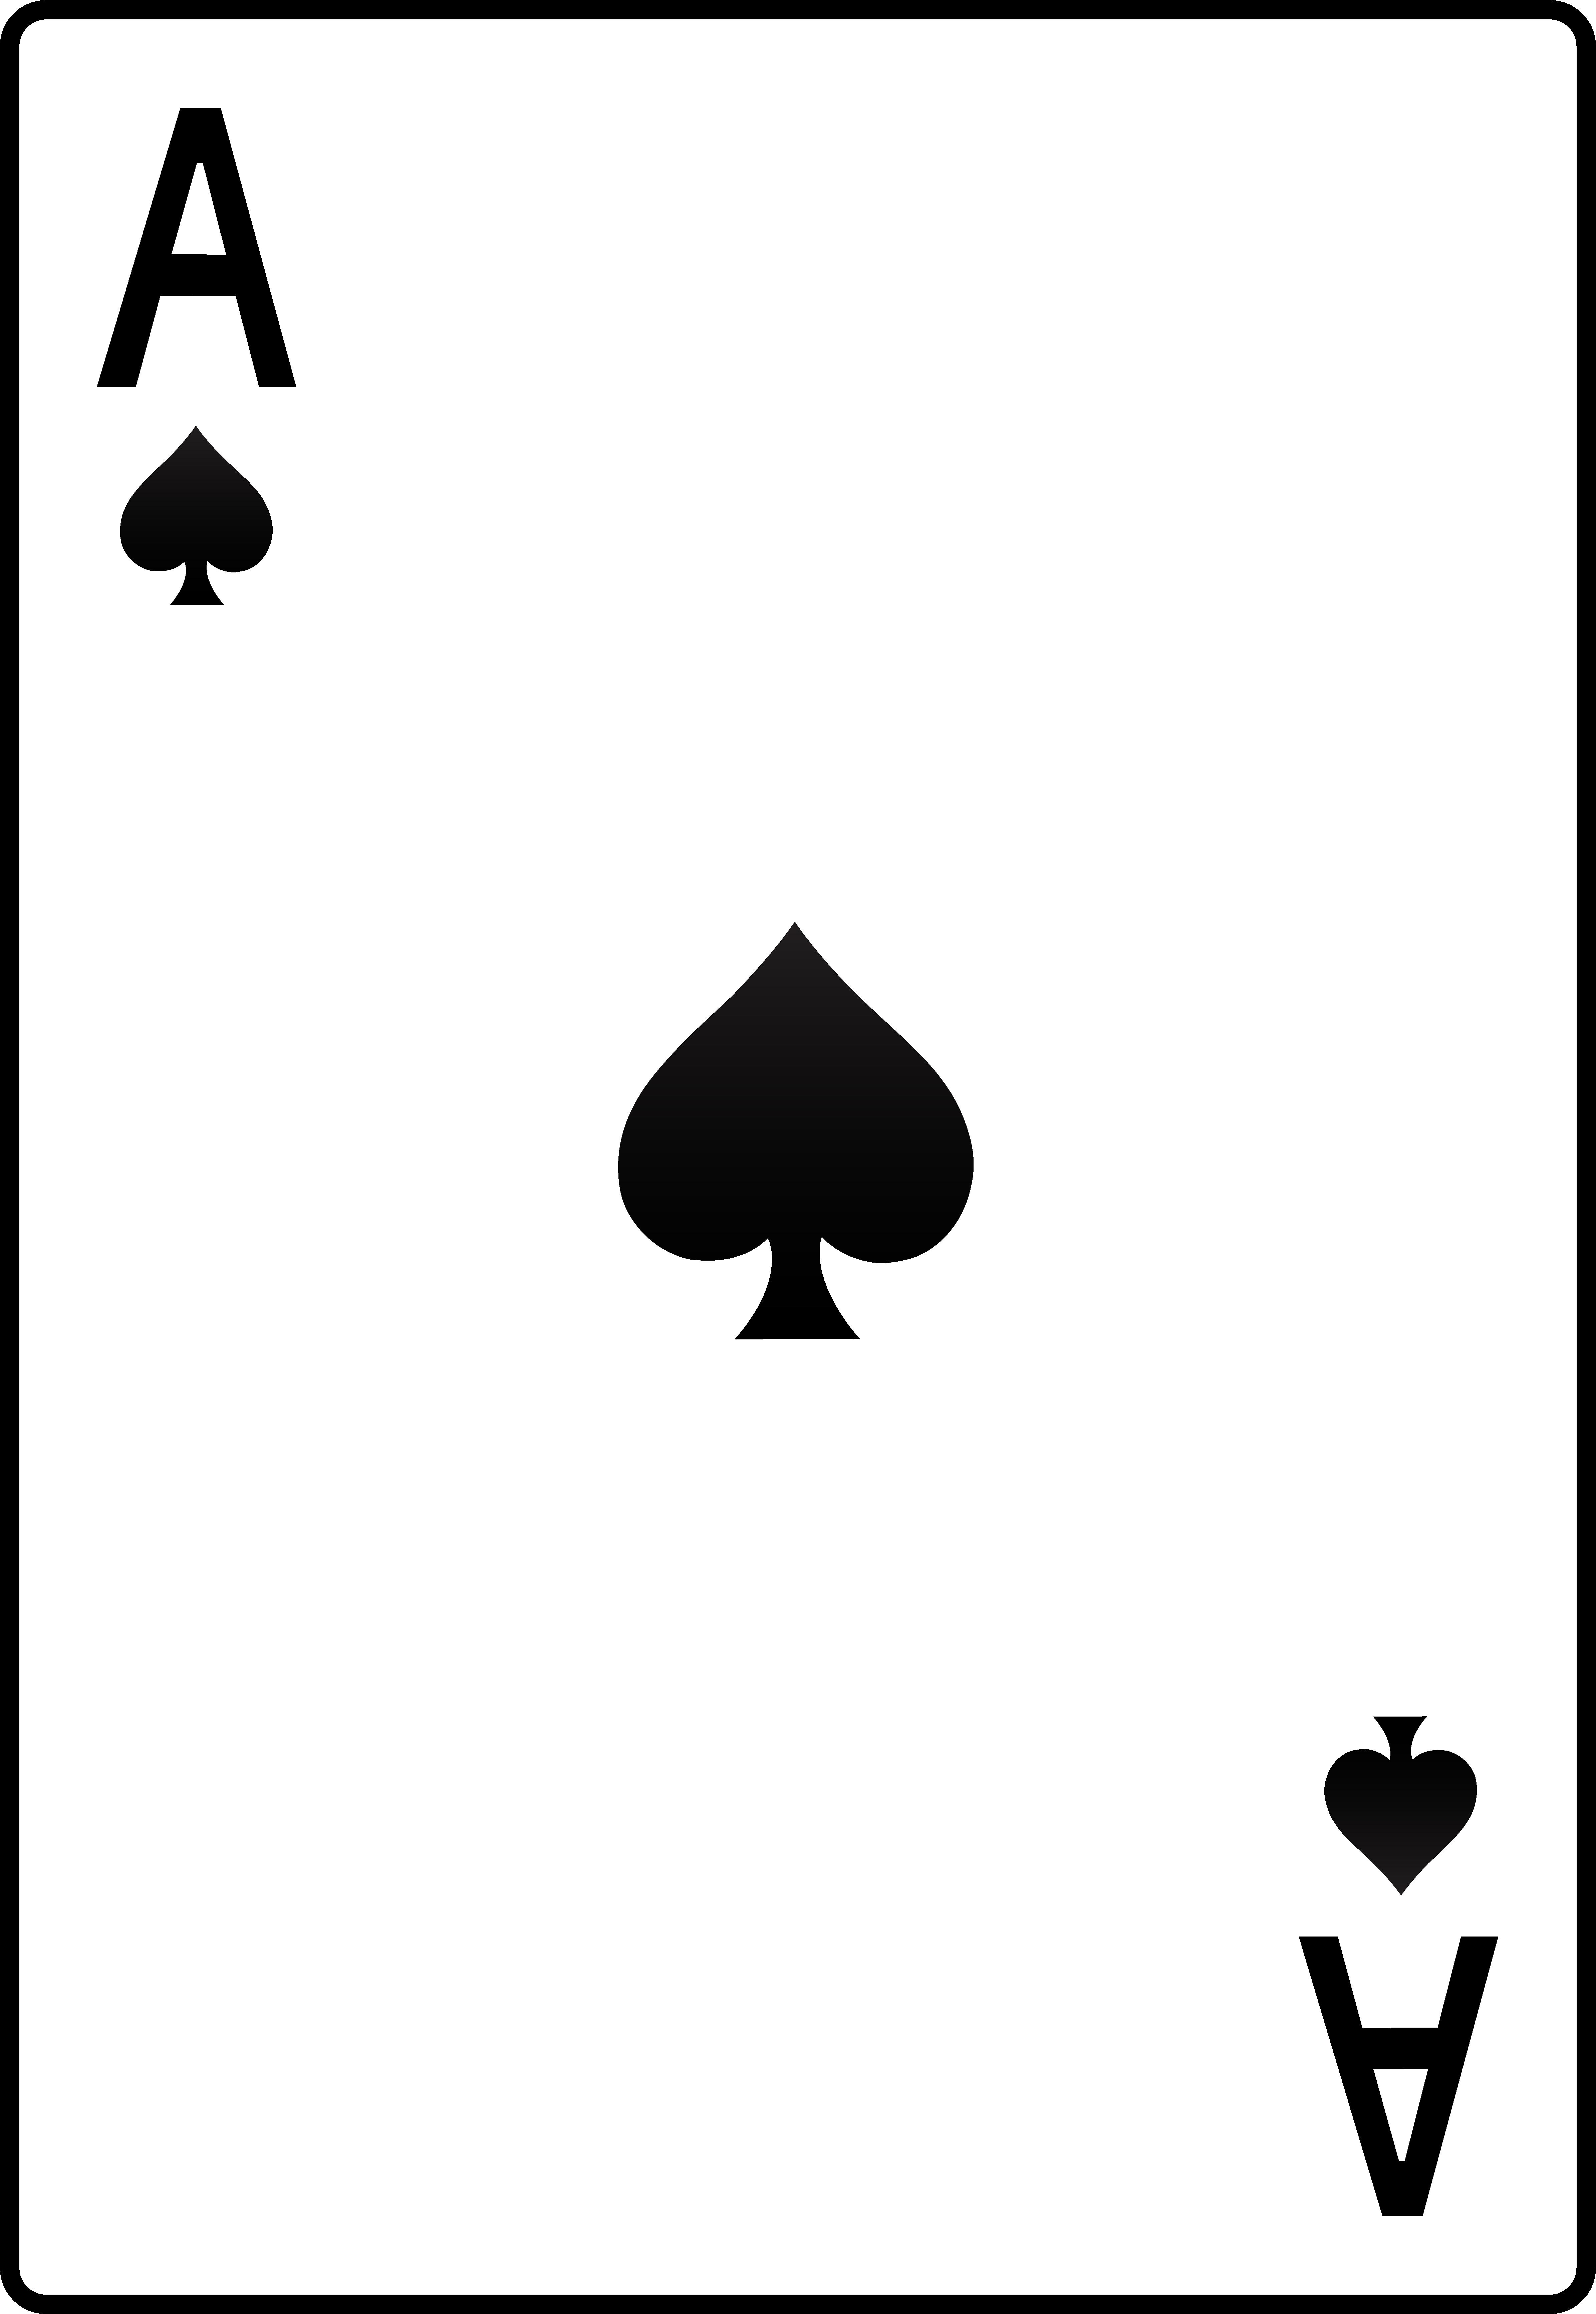 Ace 20clipart.